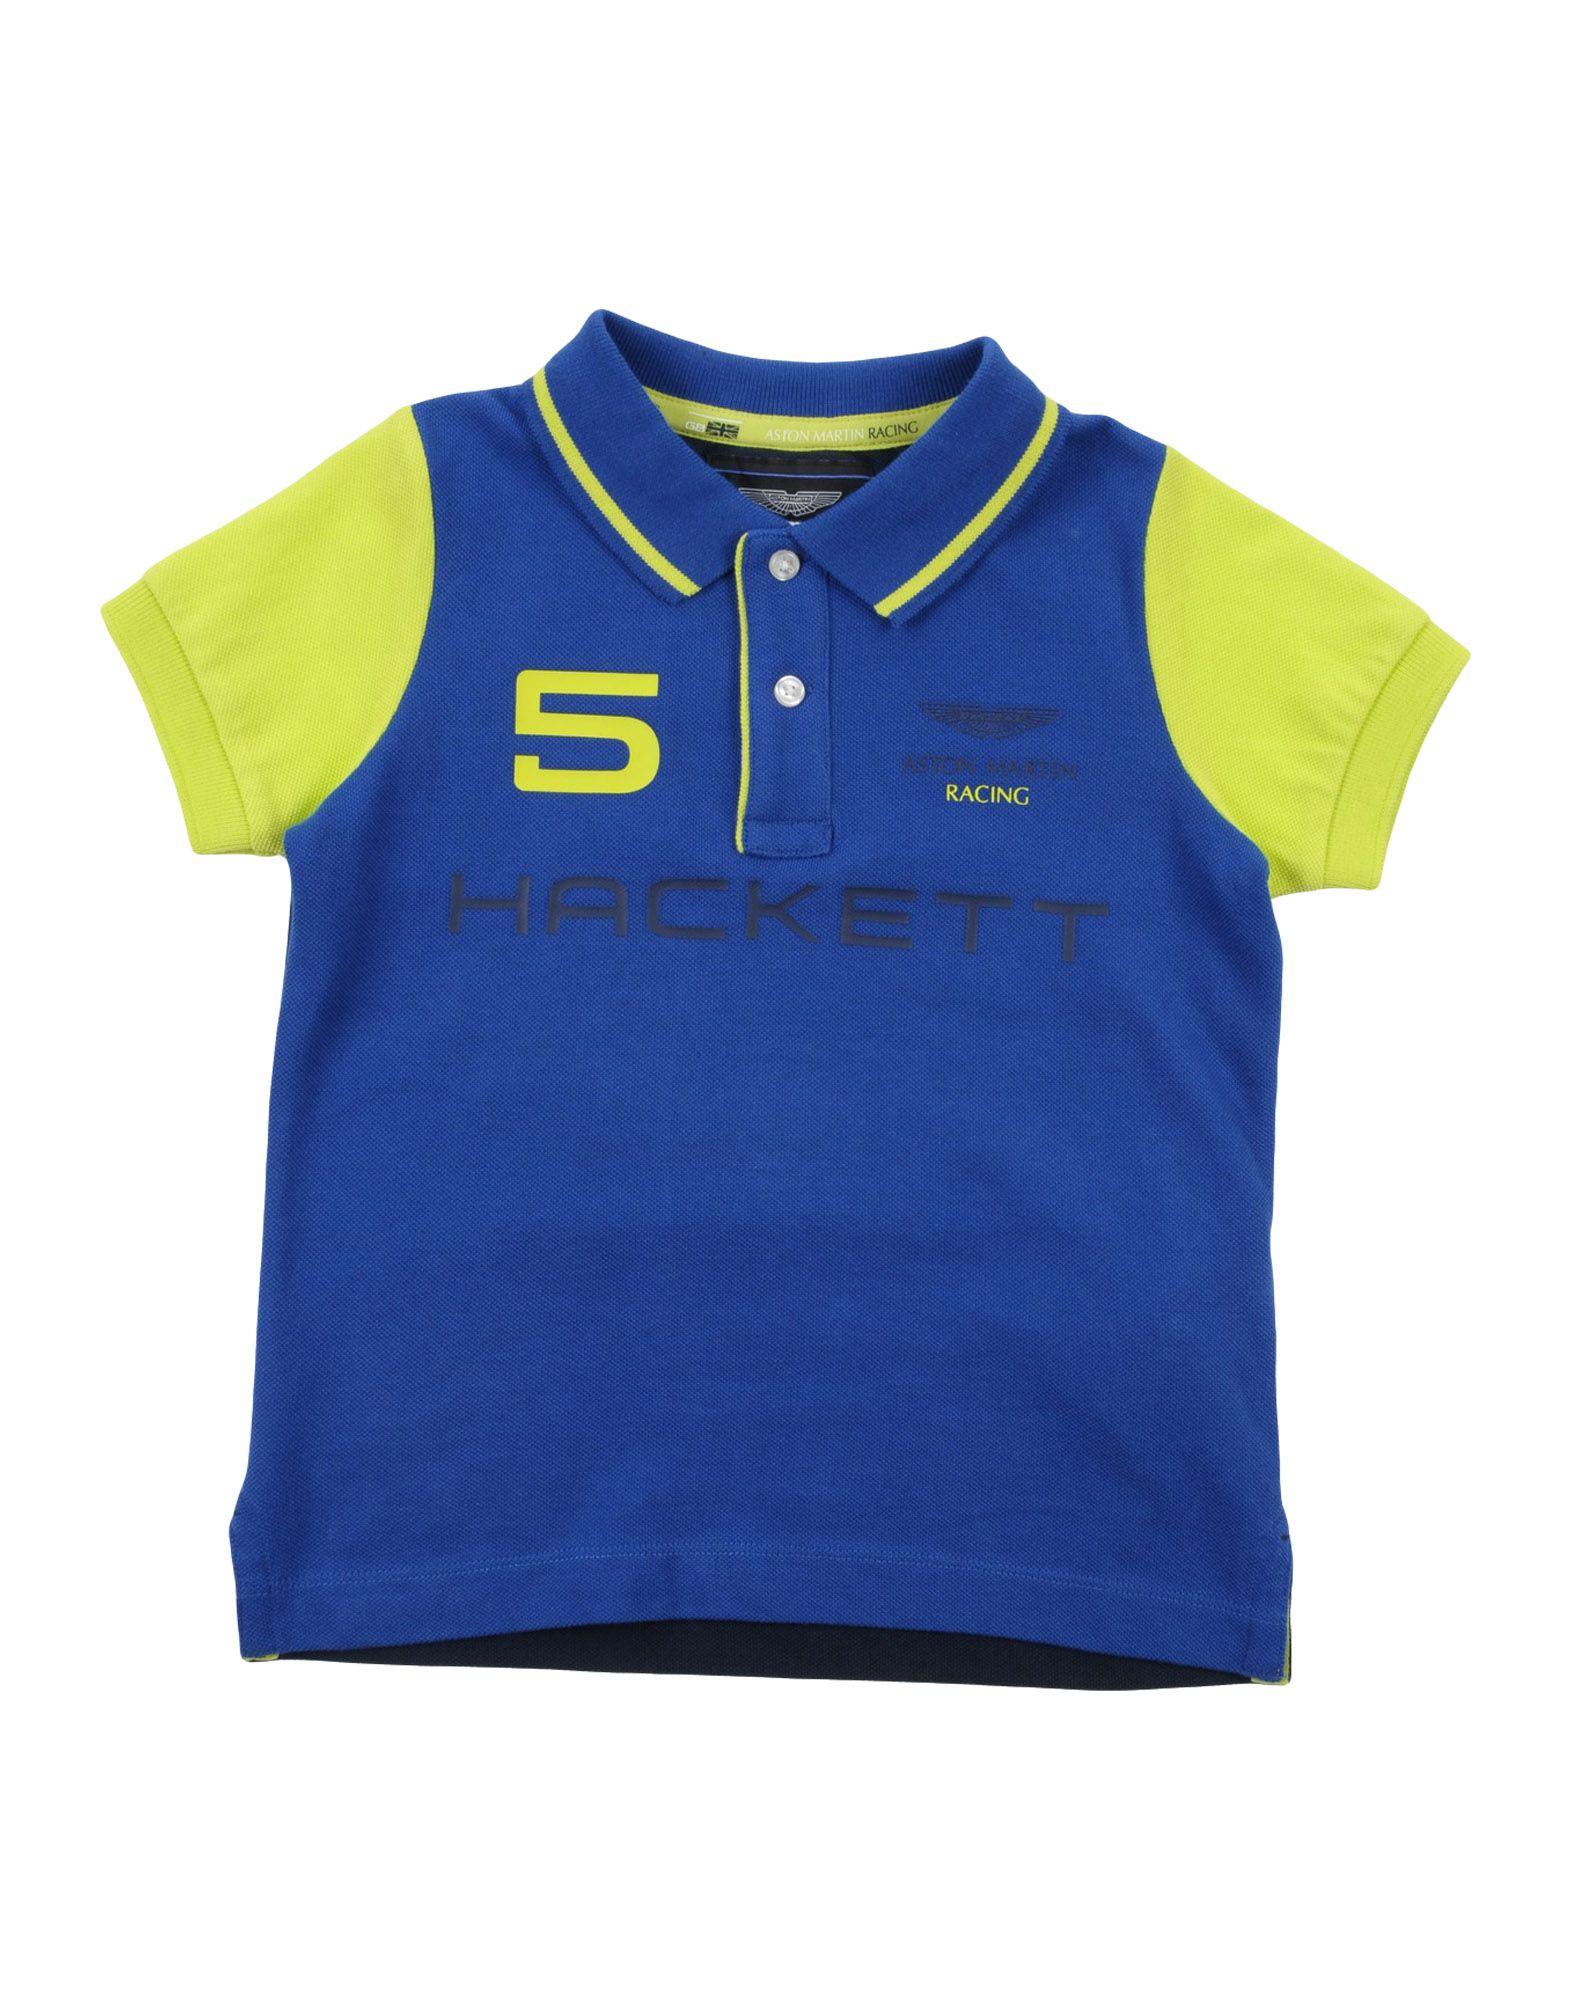 aston martin racinghackett polo shirt boy 3-8 years online on